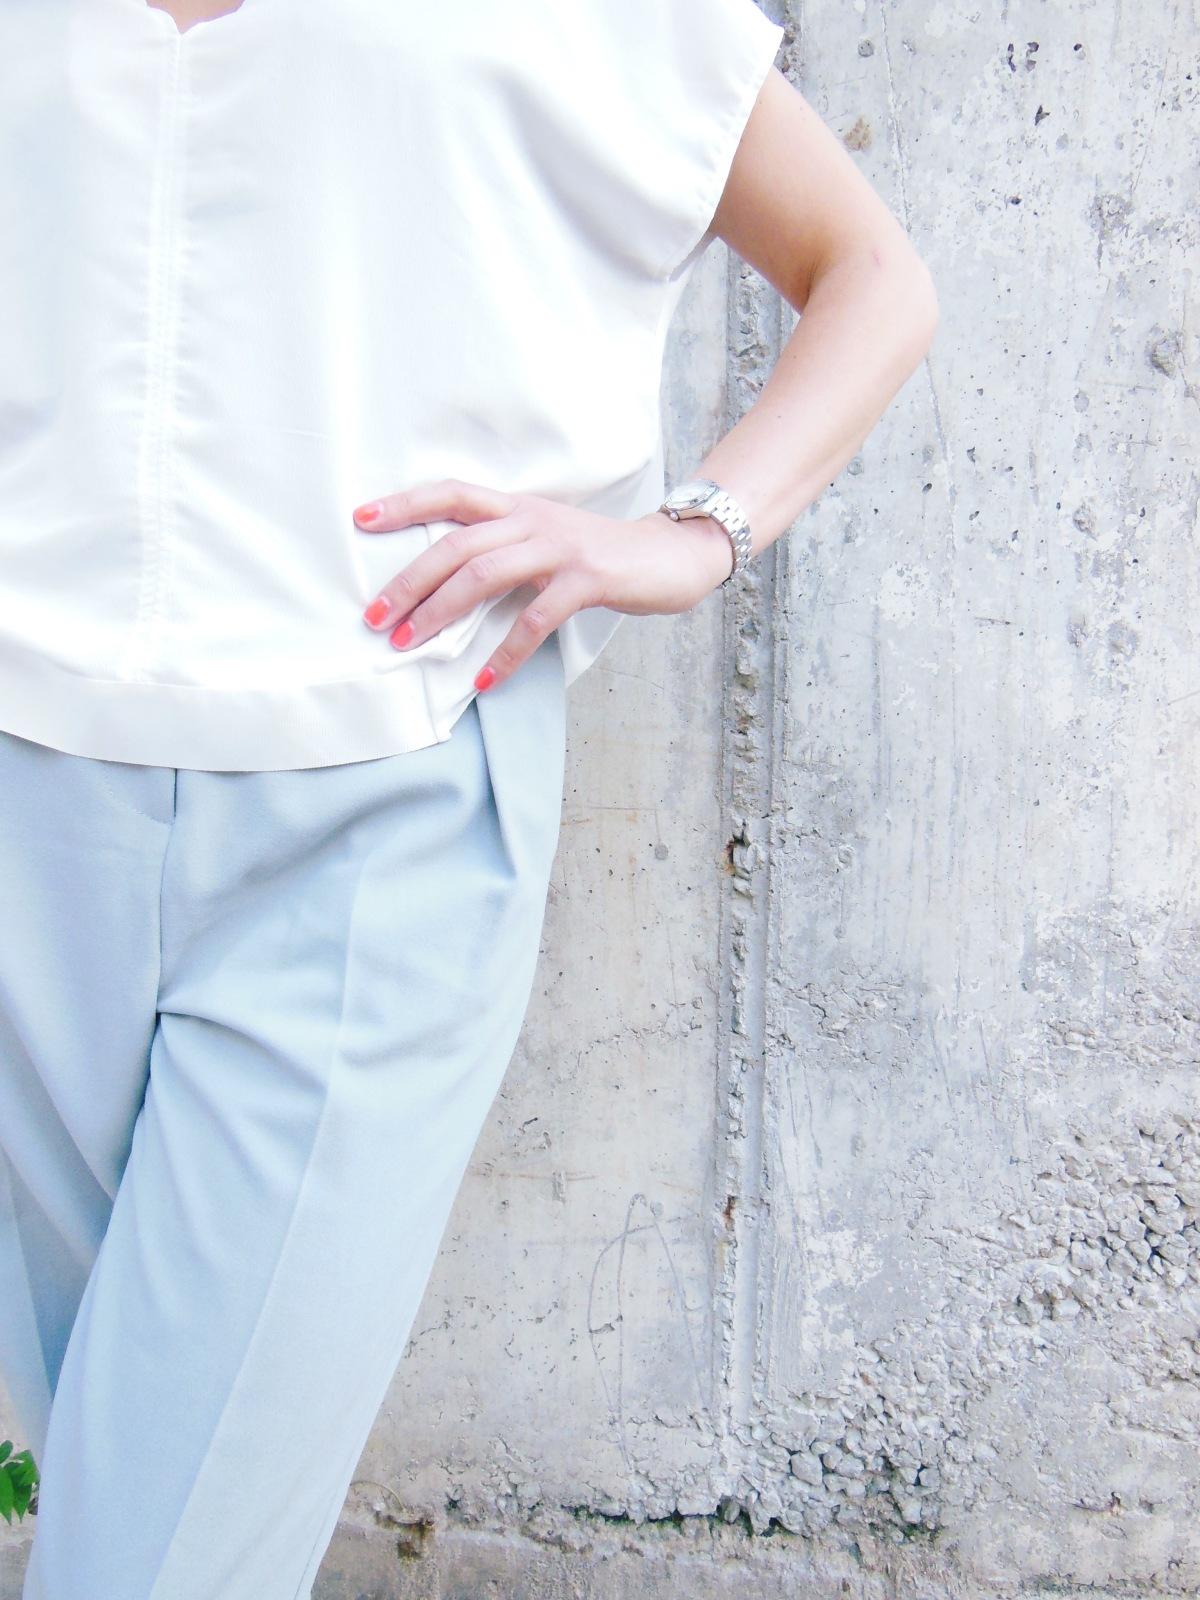 2 - HW Pants - Pro 1